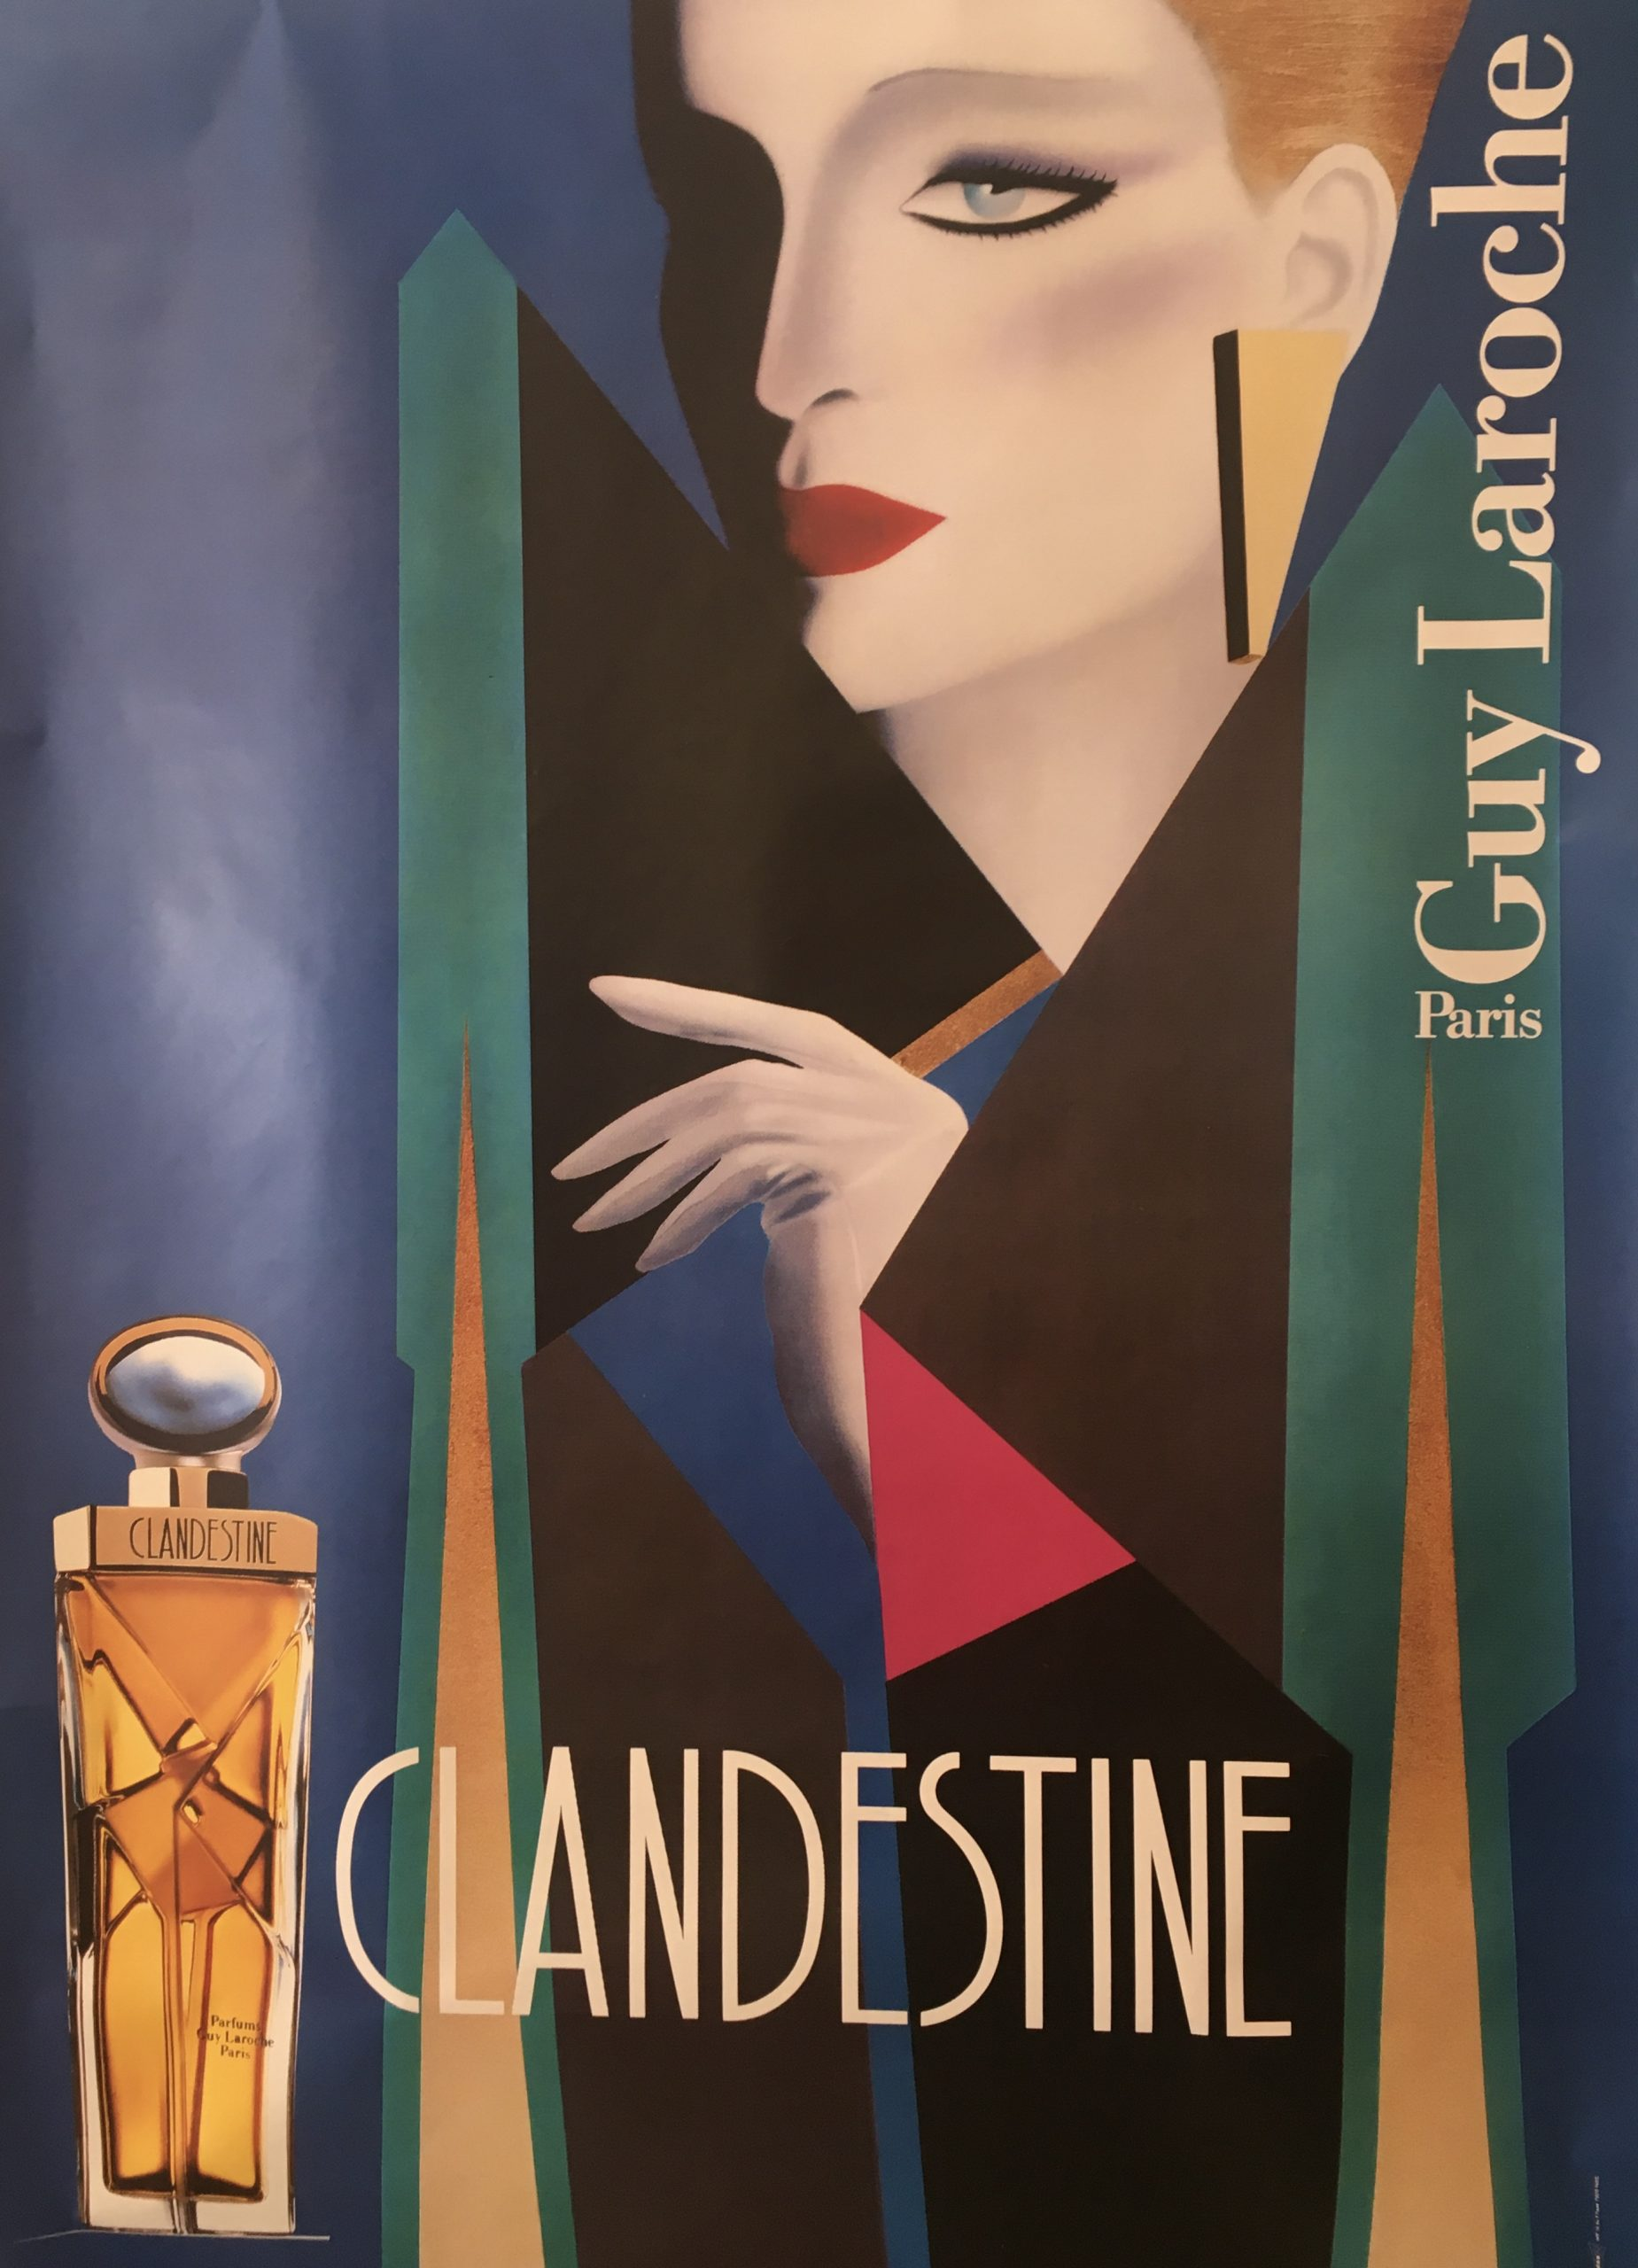 Clandestine - Guy Laroche by Razzia Original Vintage Poster